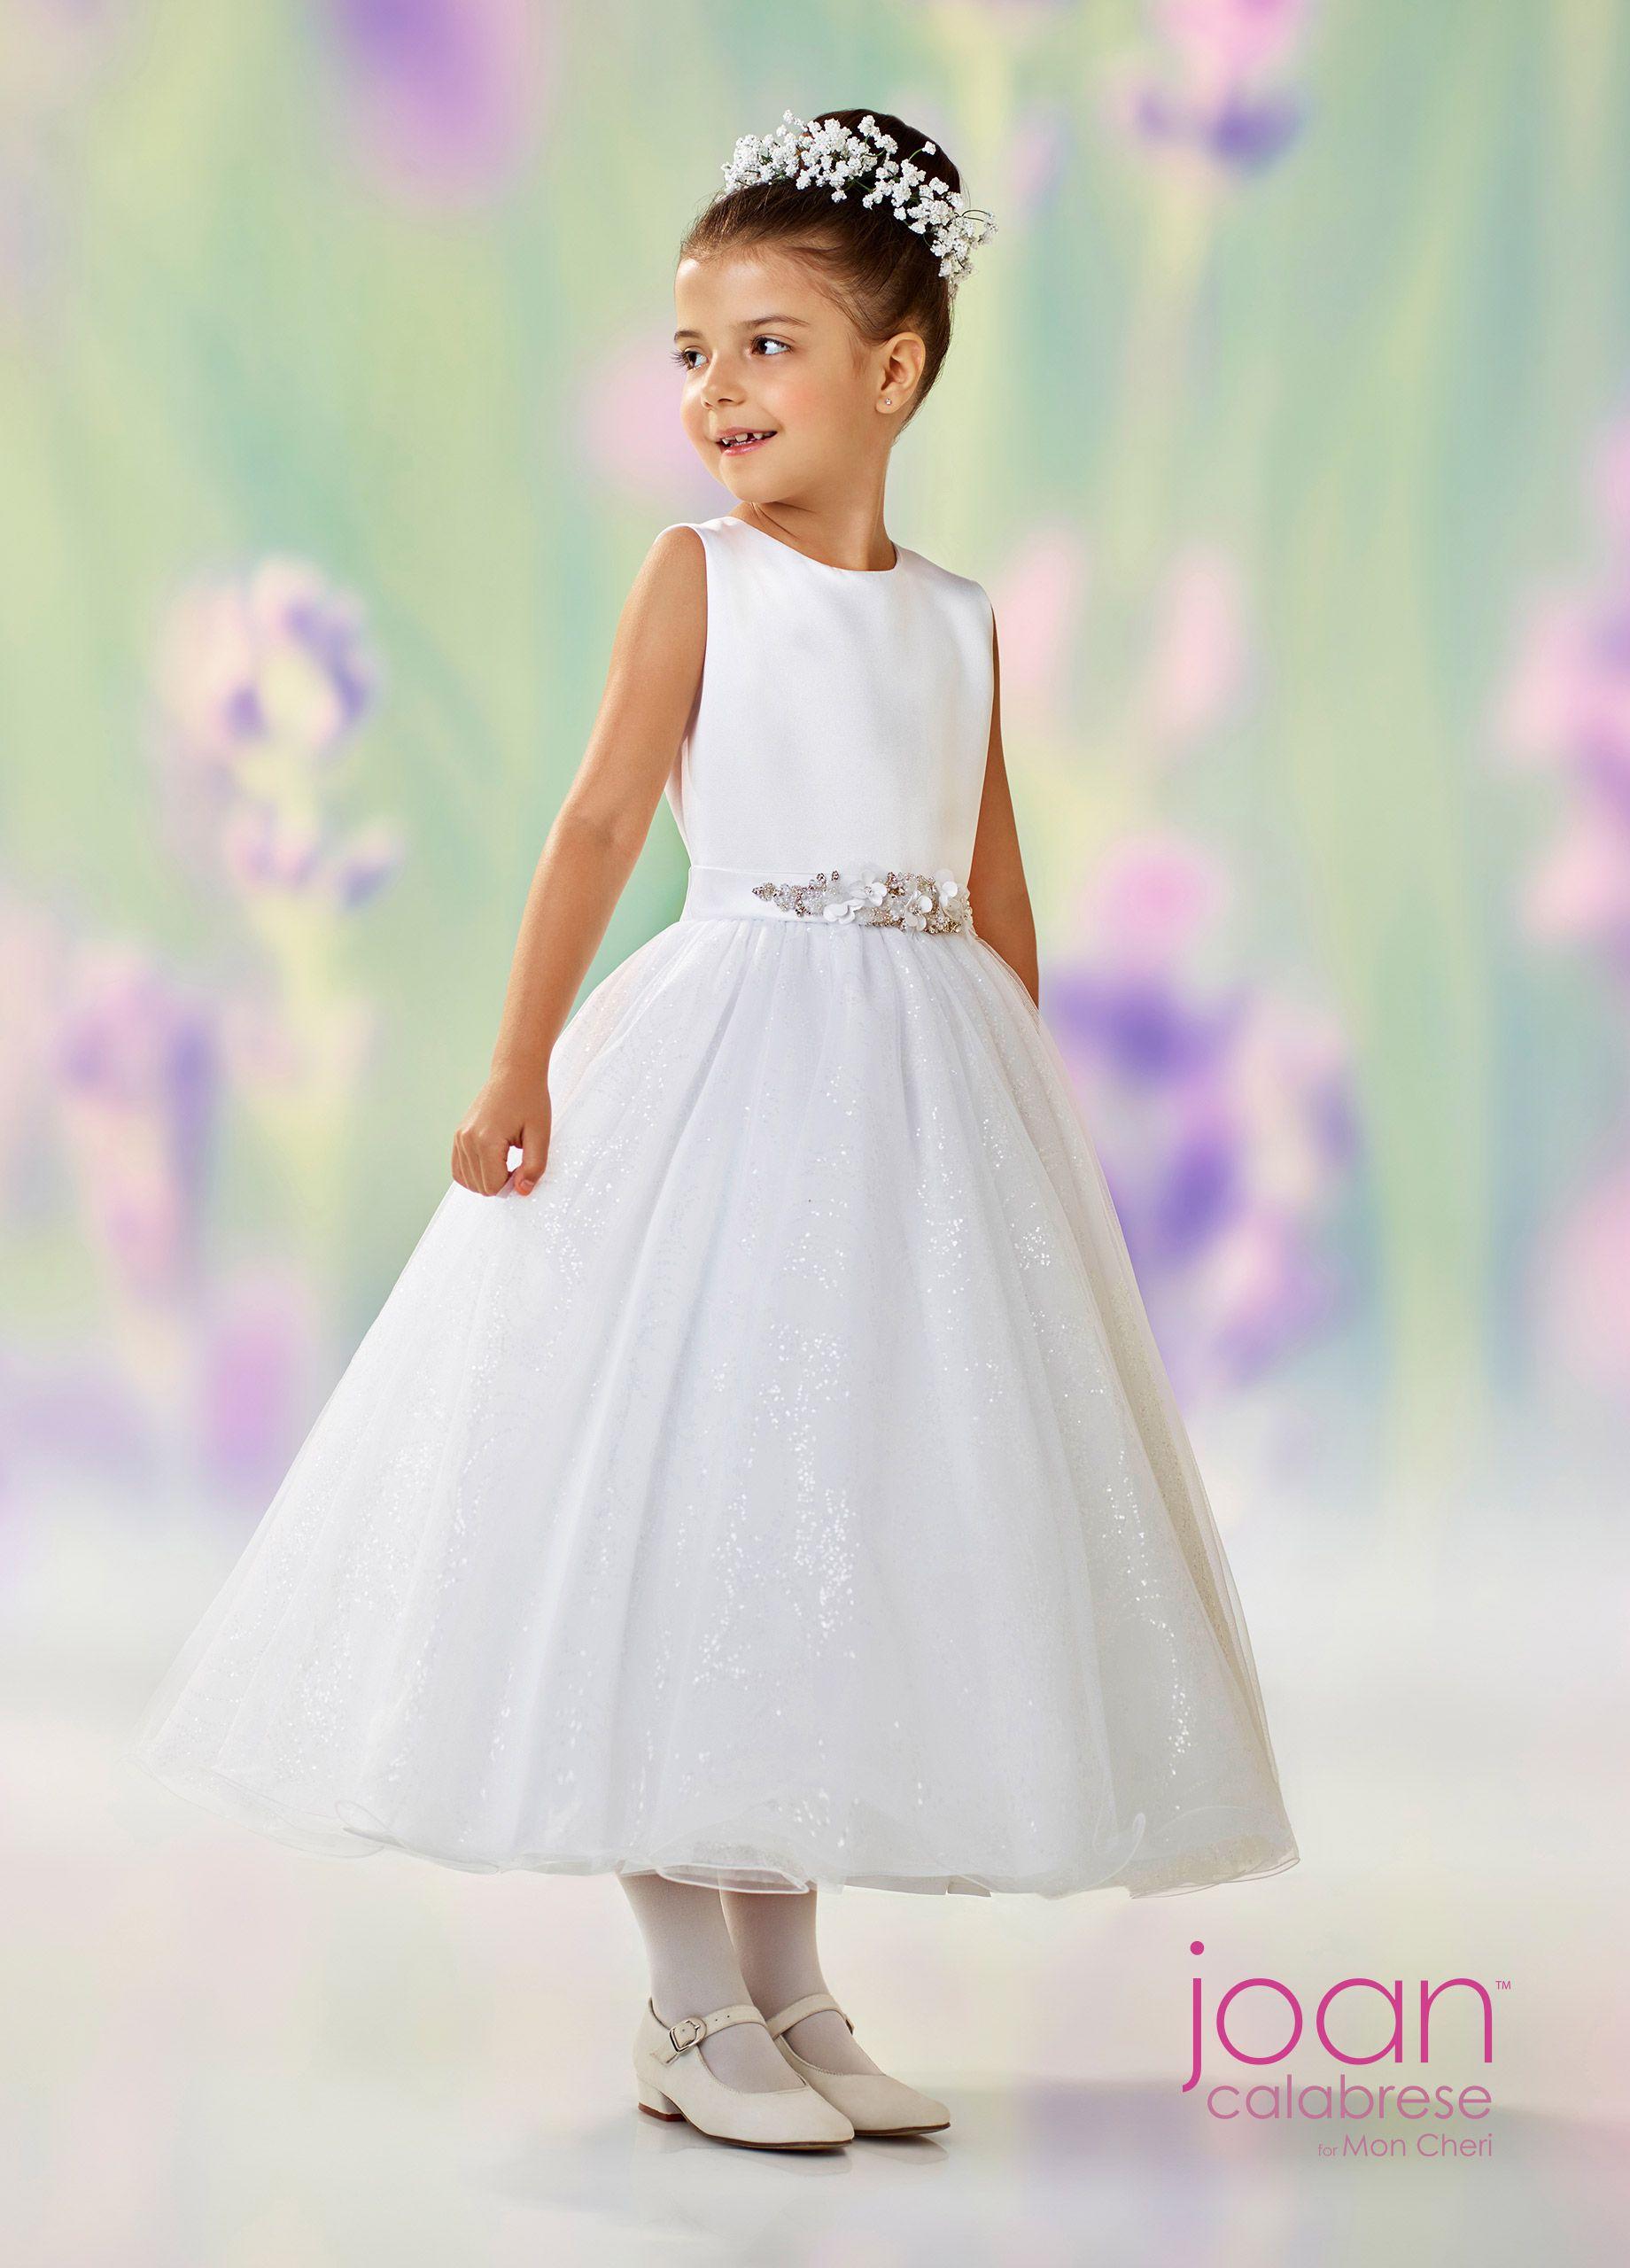 93d317d9430 Joan Calabrese Flower Girl Dresses | First Communion Dresses ...